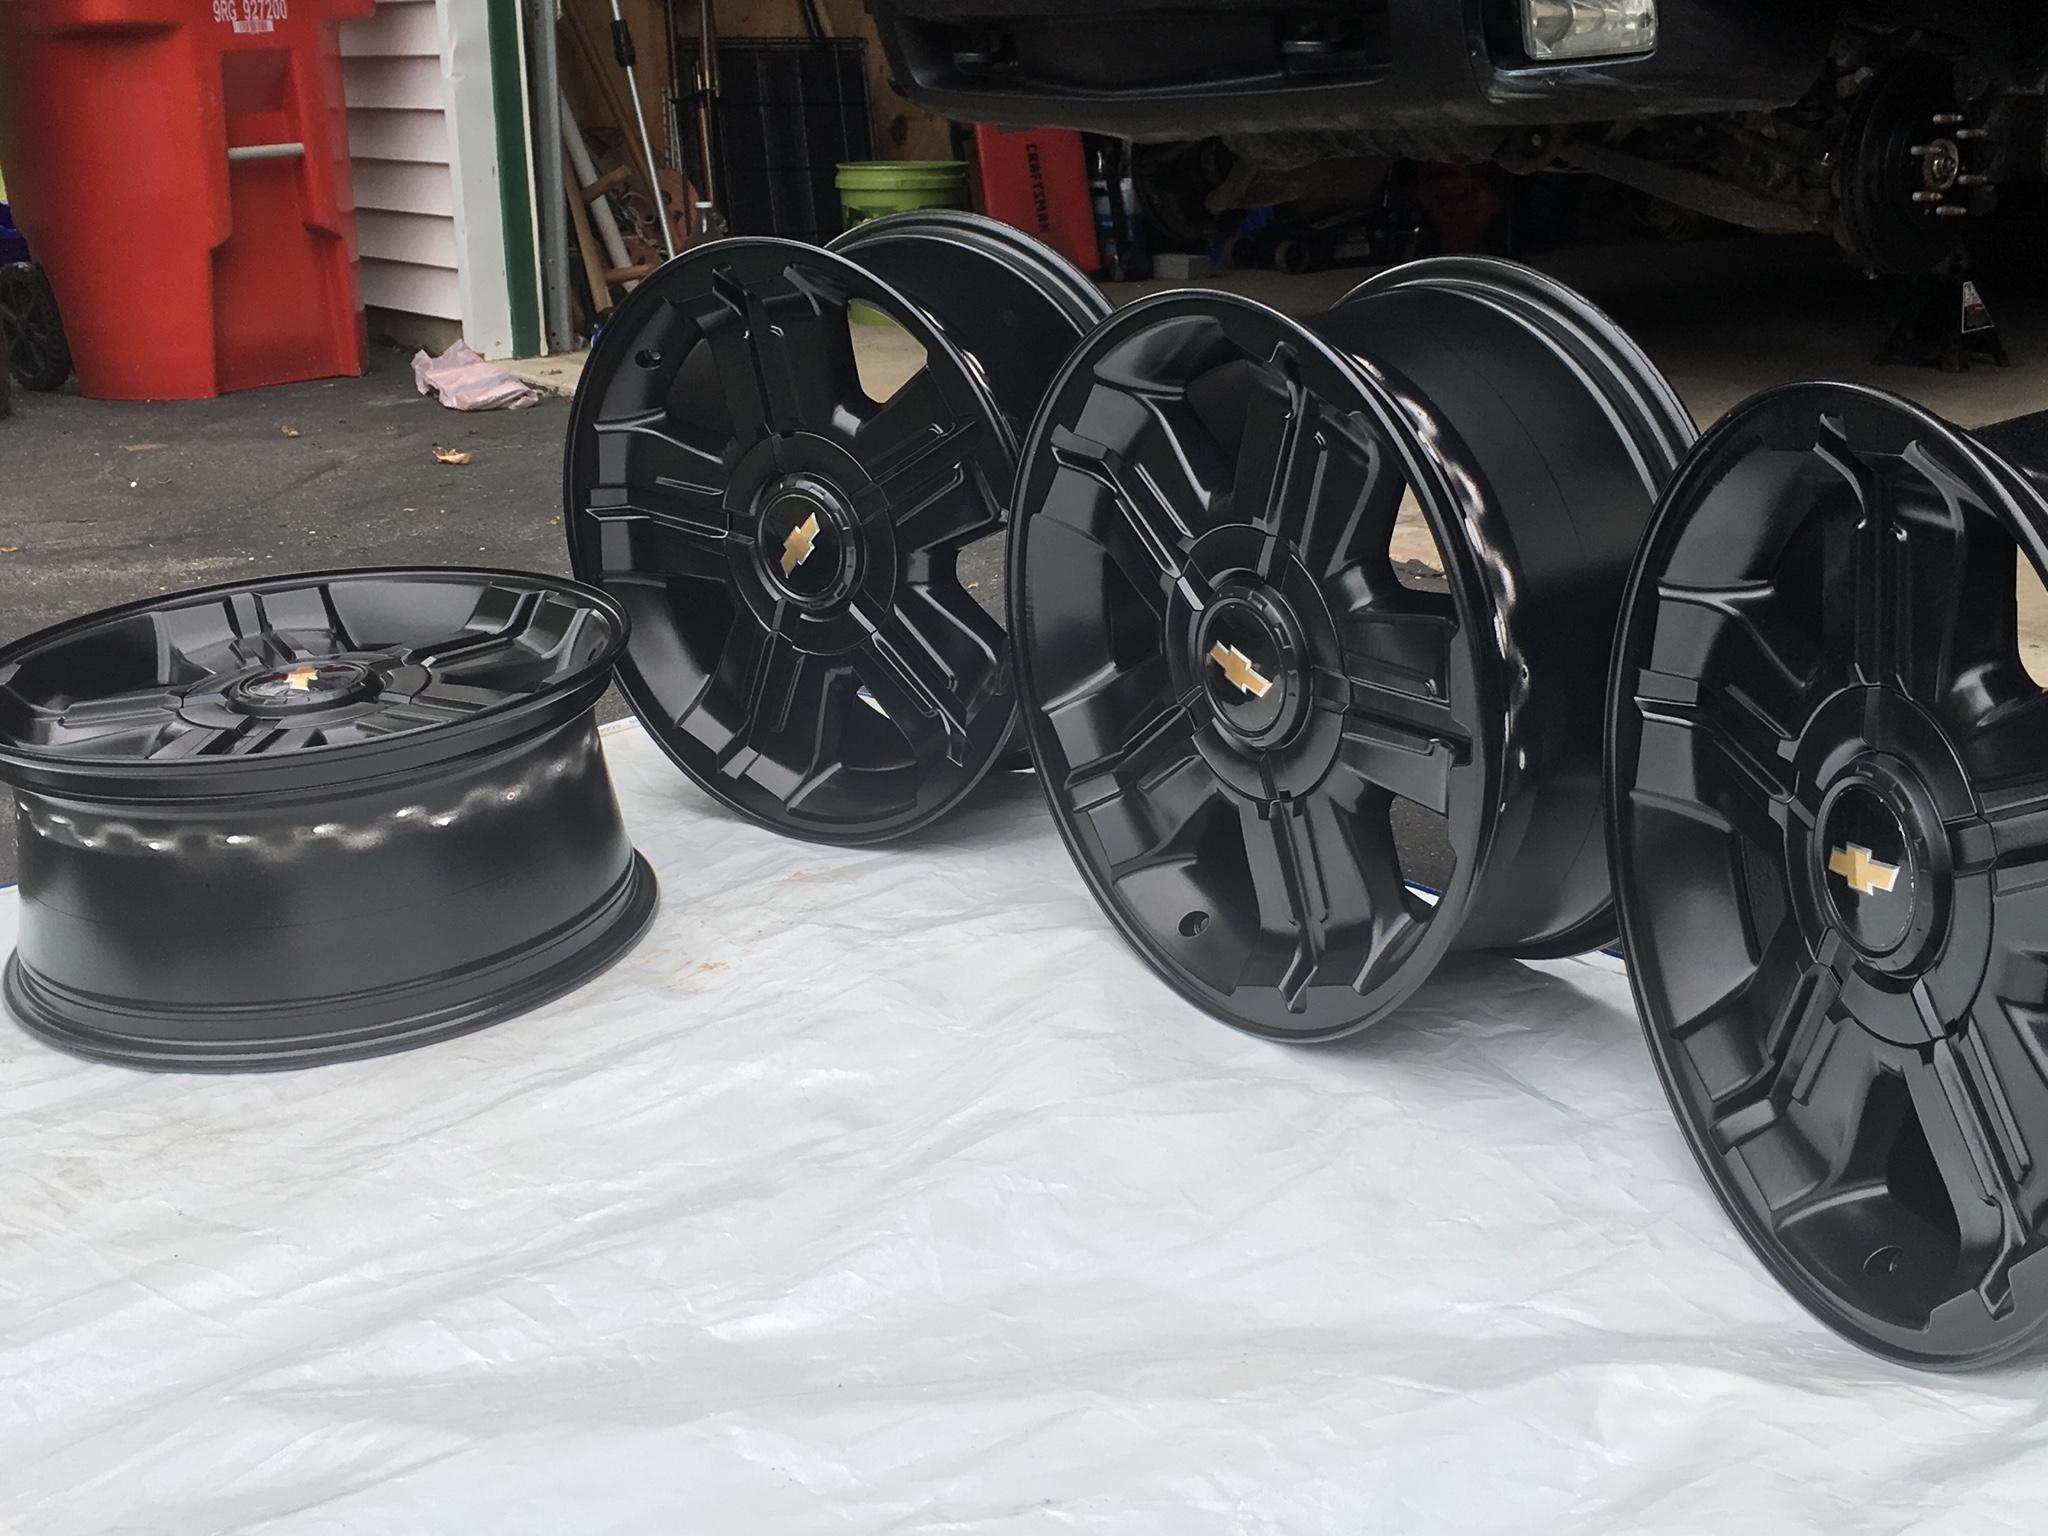 Gmc Sierra Truck >> SilveradoSierra.com • 2011 Silverado stock black wheels ...